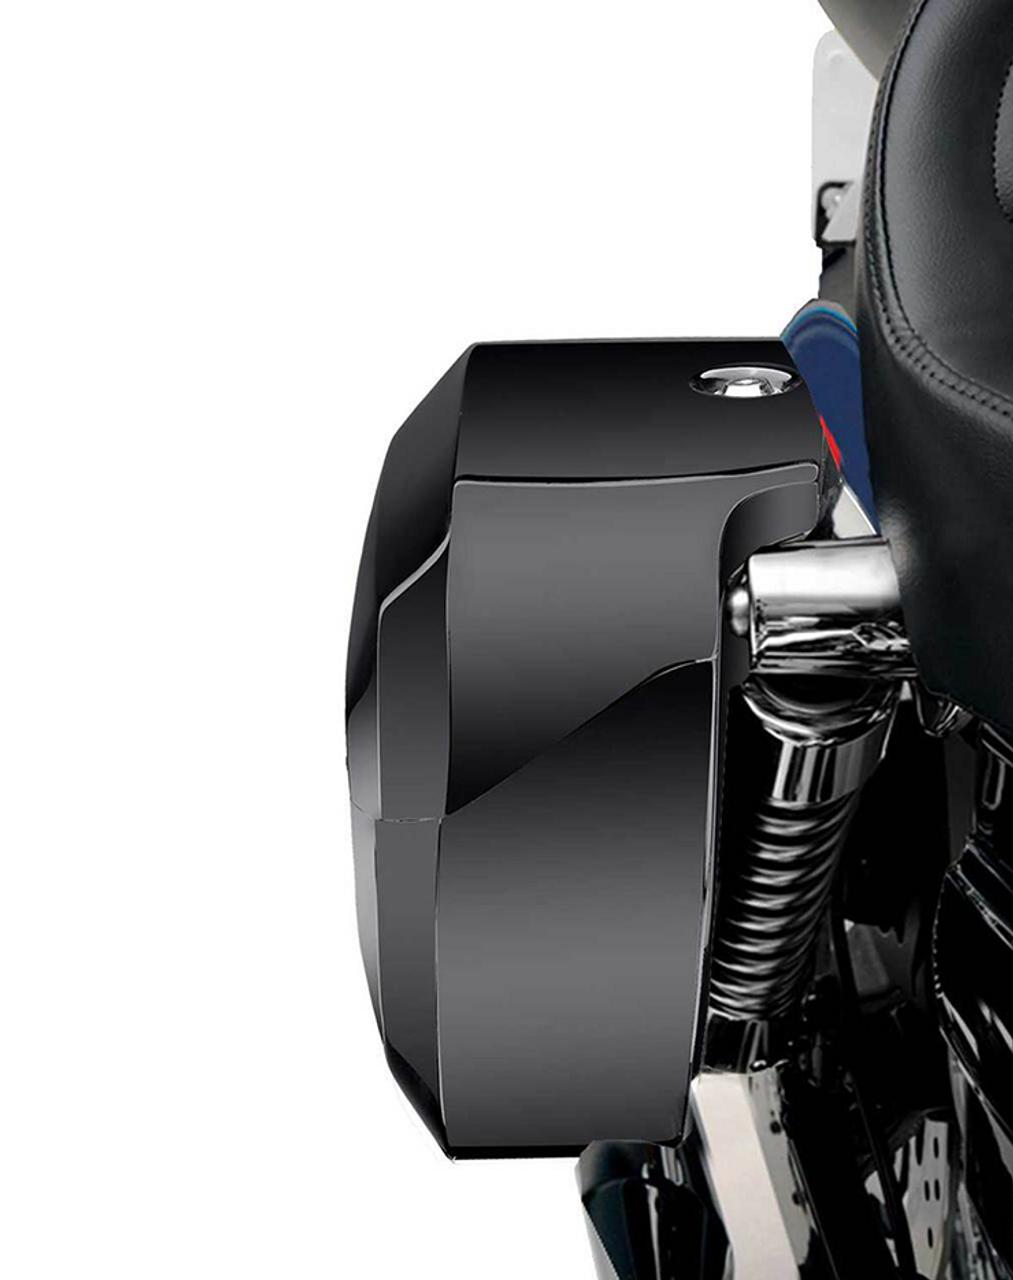 Honda VTX 1800 N Viking Lamellar Large Spear Shock Cutout Hard Saddlebags Shock Cutout View